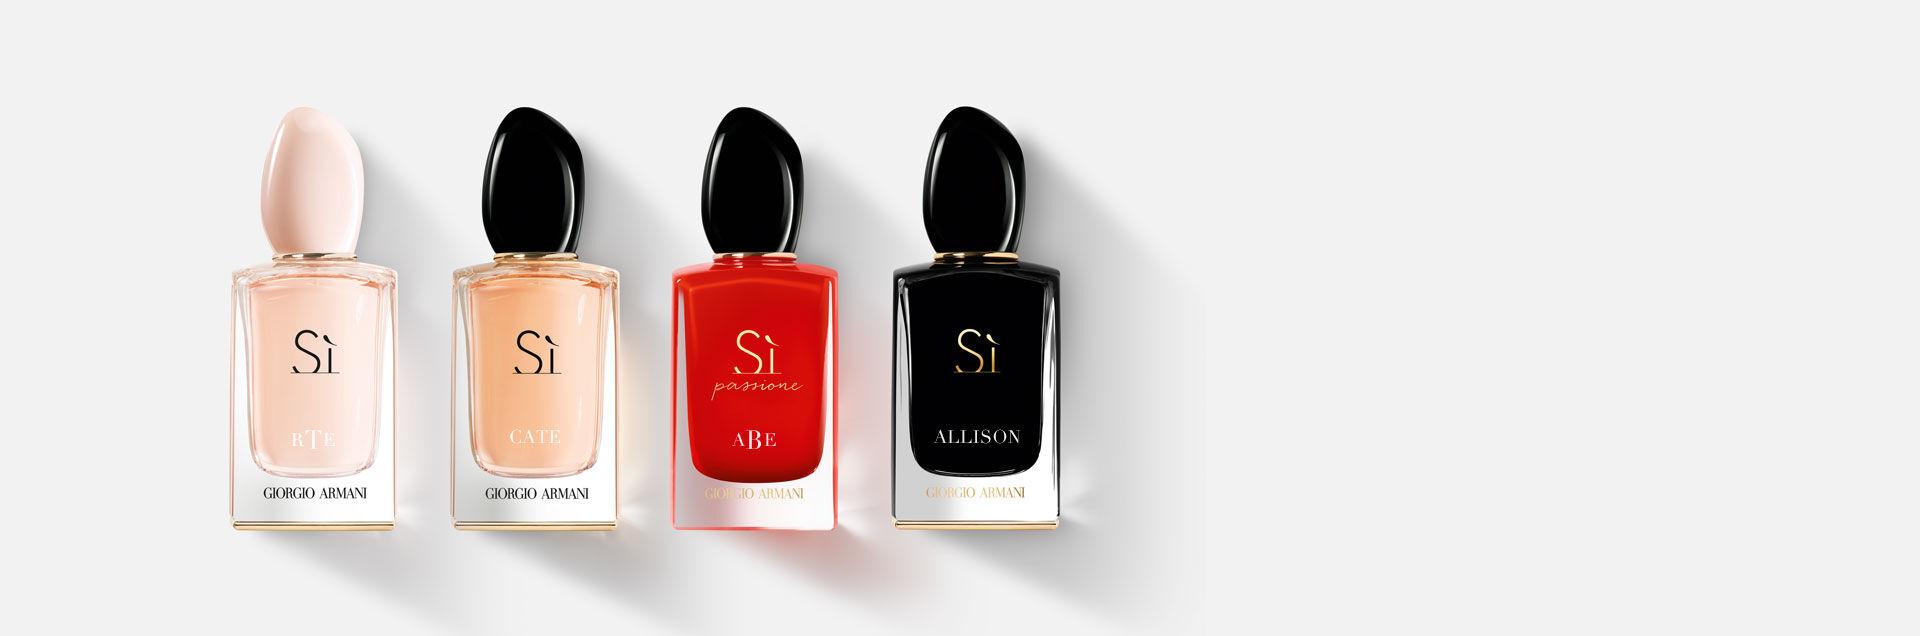 Si Womens Fragrance Giorgio Armani Beauty